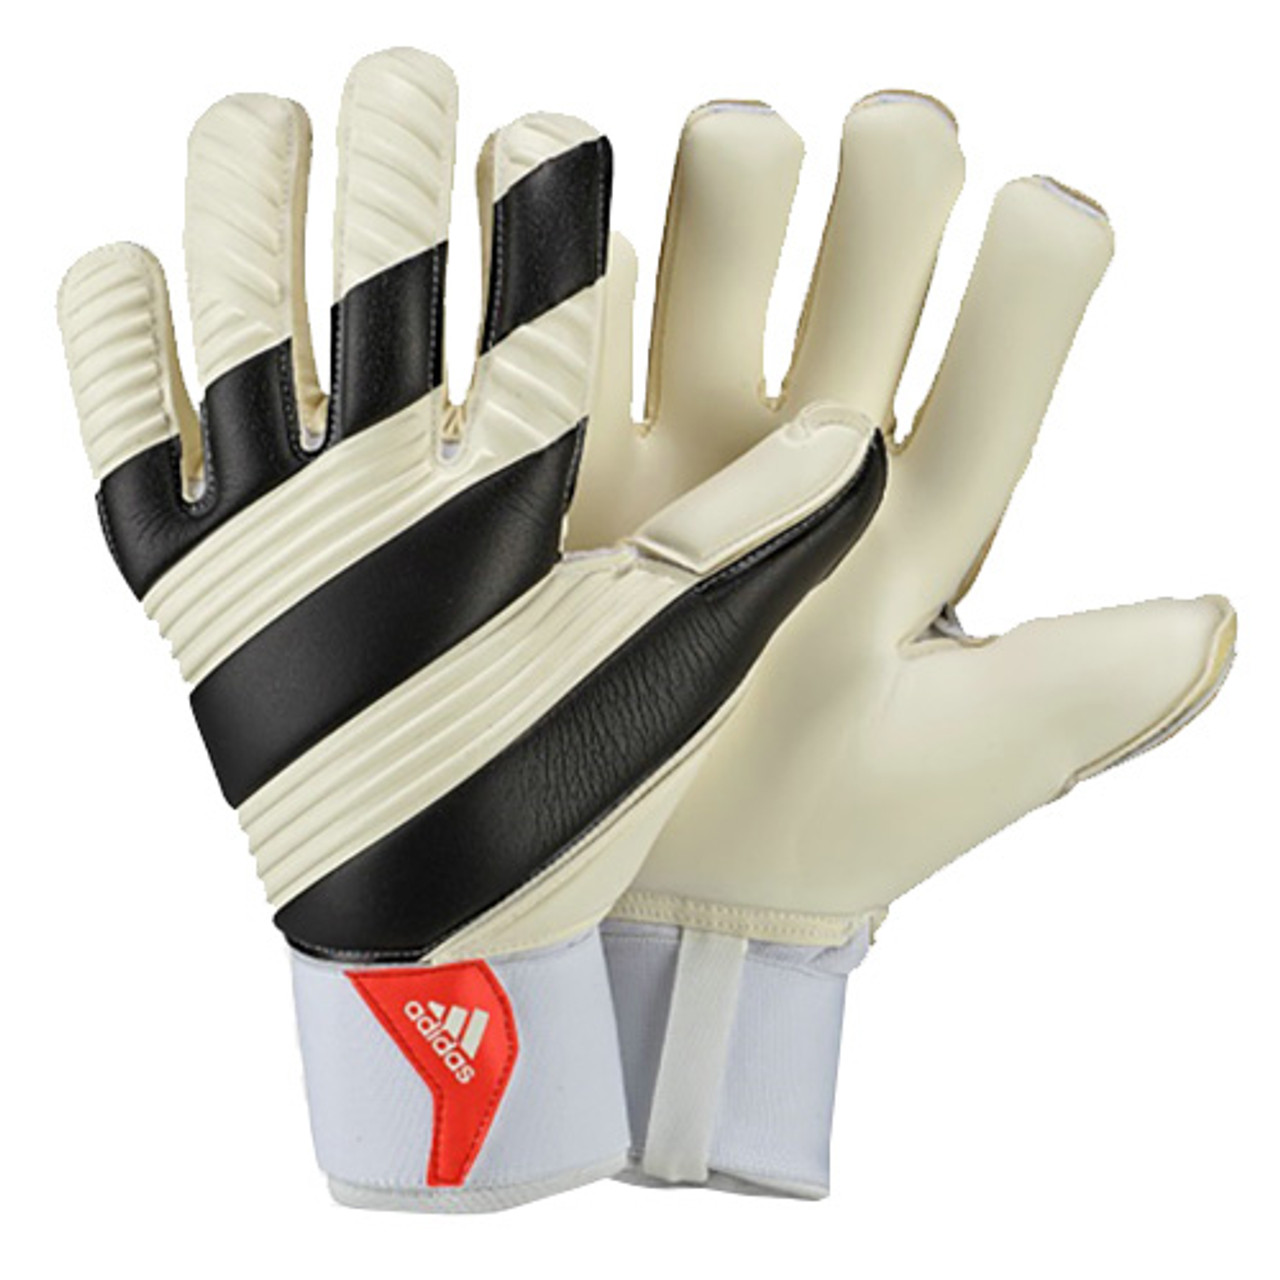 alegría Sastre Ambiguo  Adidas Classic Pro Soccer Goalie Gloves-Player's Equipment-Soccer    Marchants.com